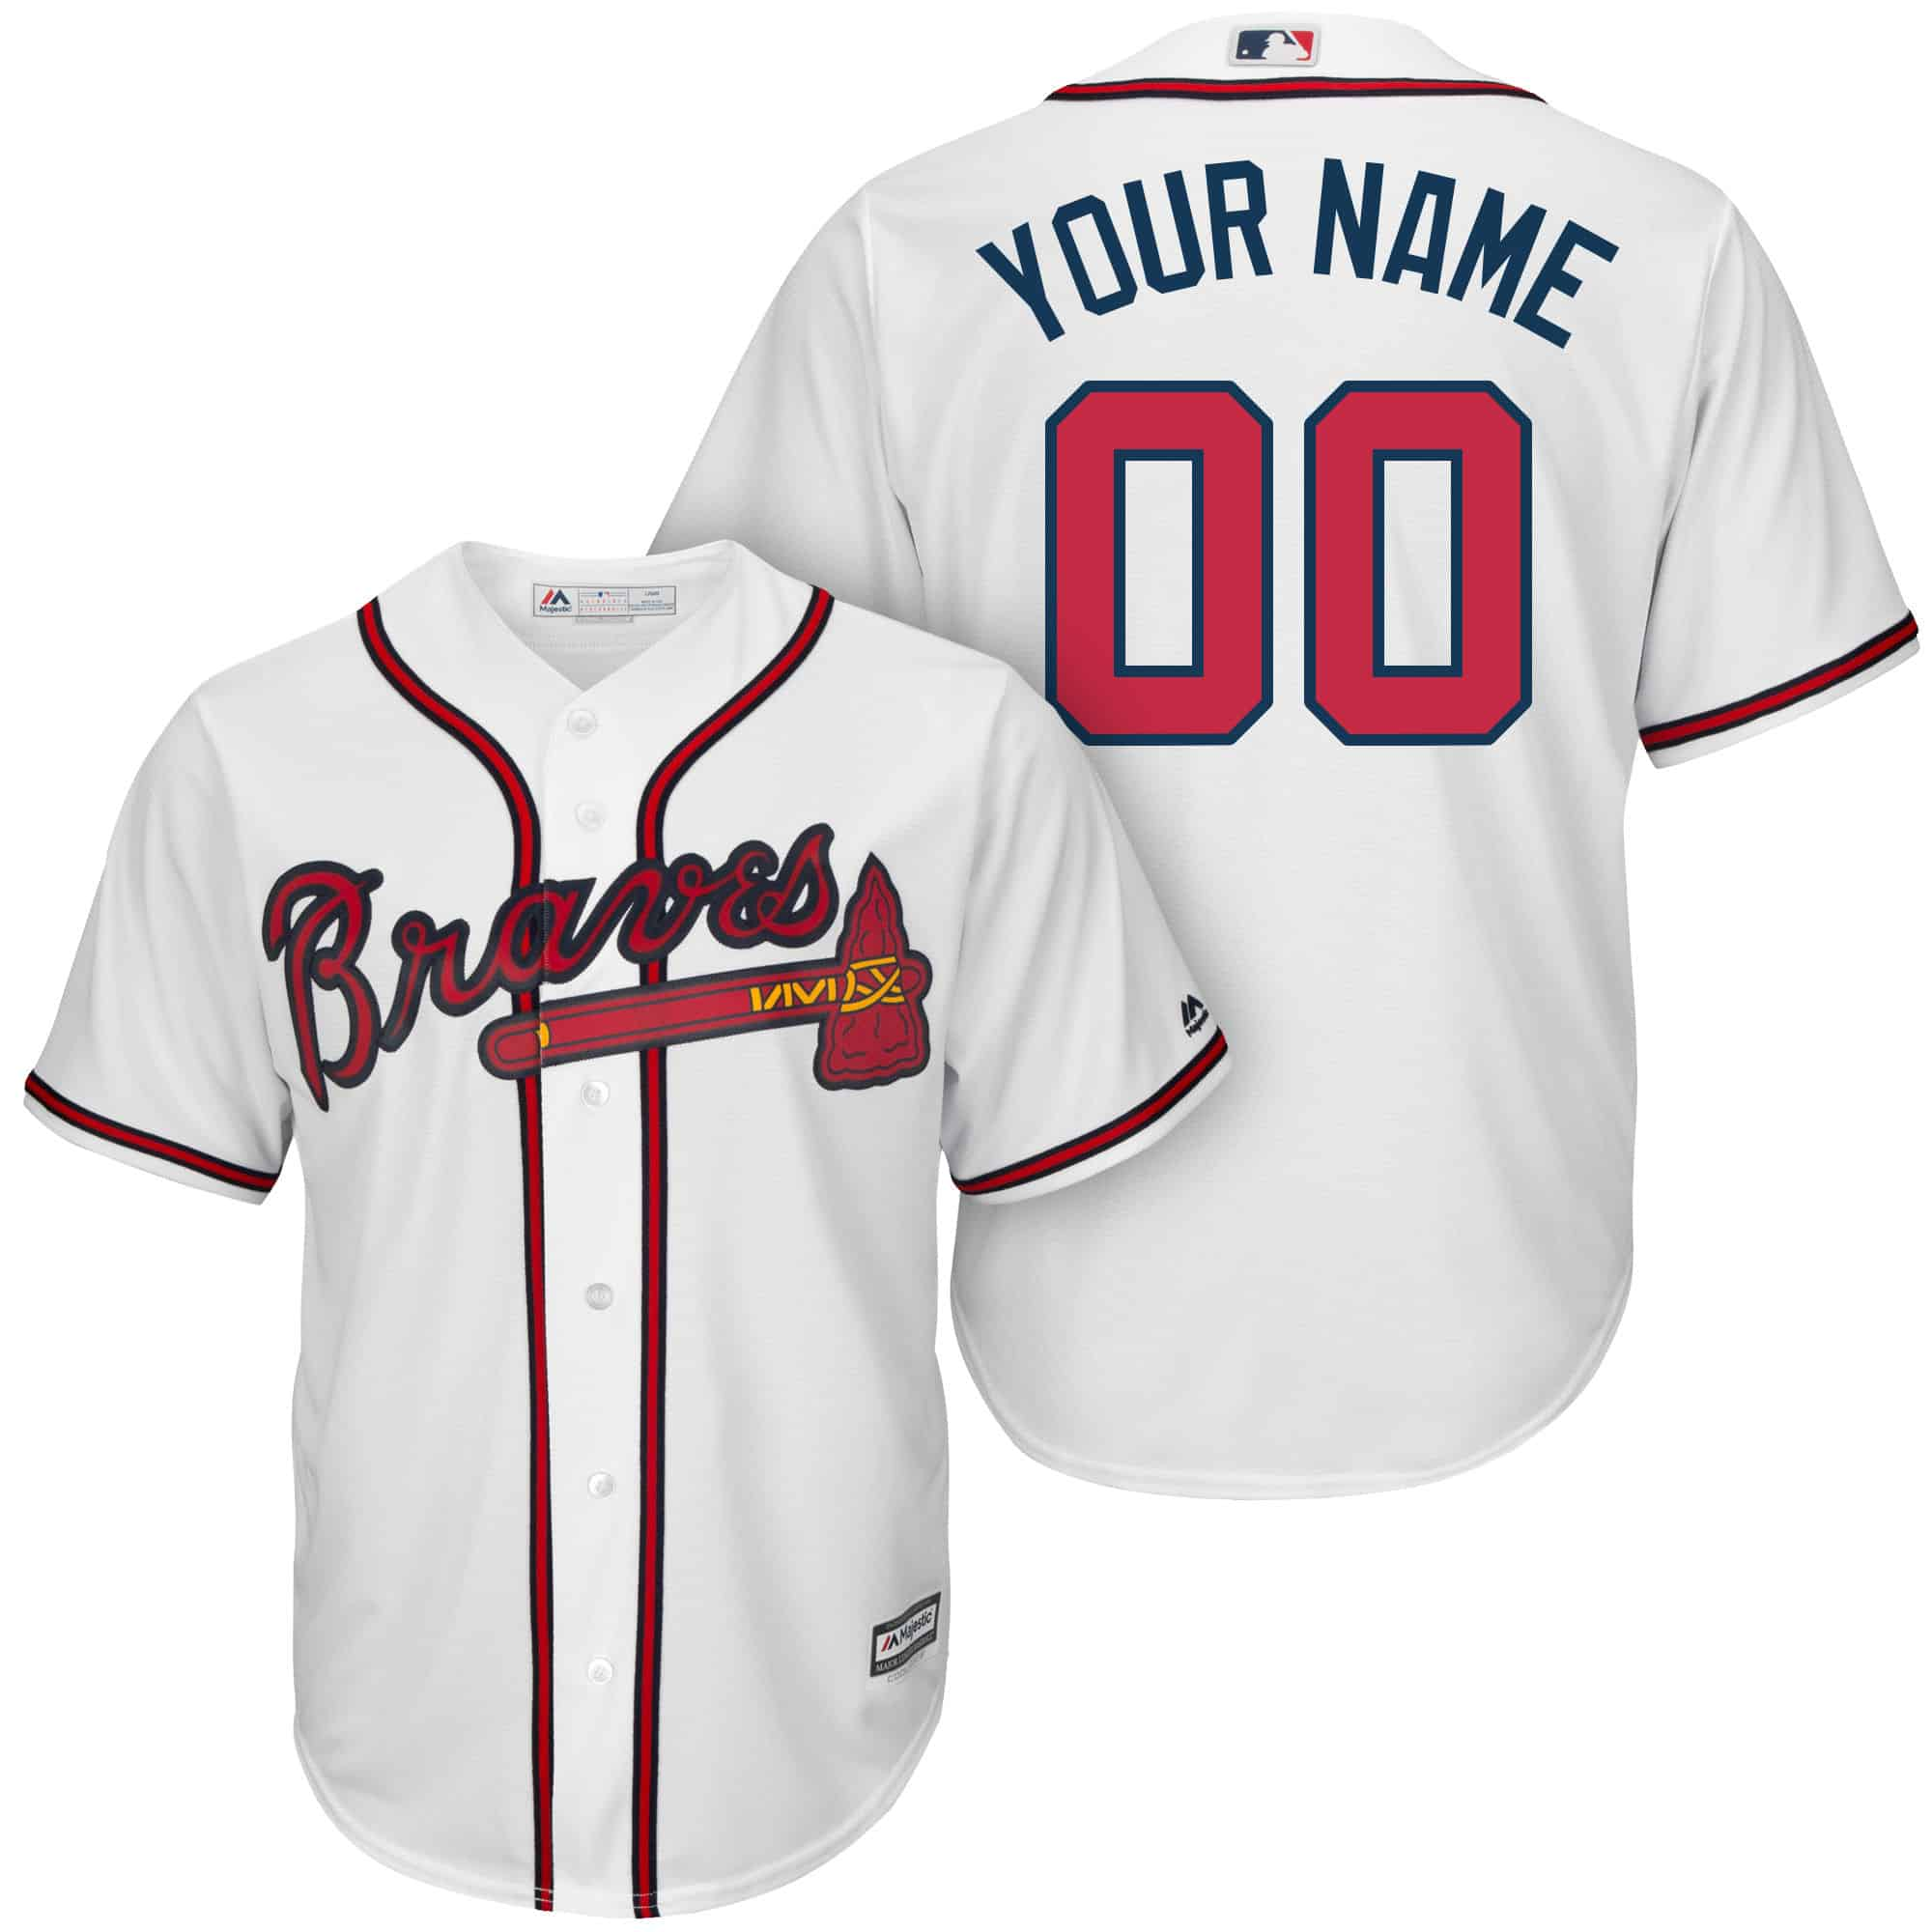 Atlanta braves jersey tee hoodie s 2x big 3x 4x 5x 6x for Big and tall custom shirts